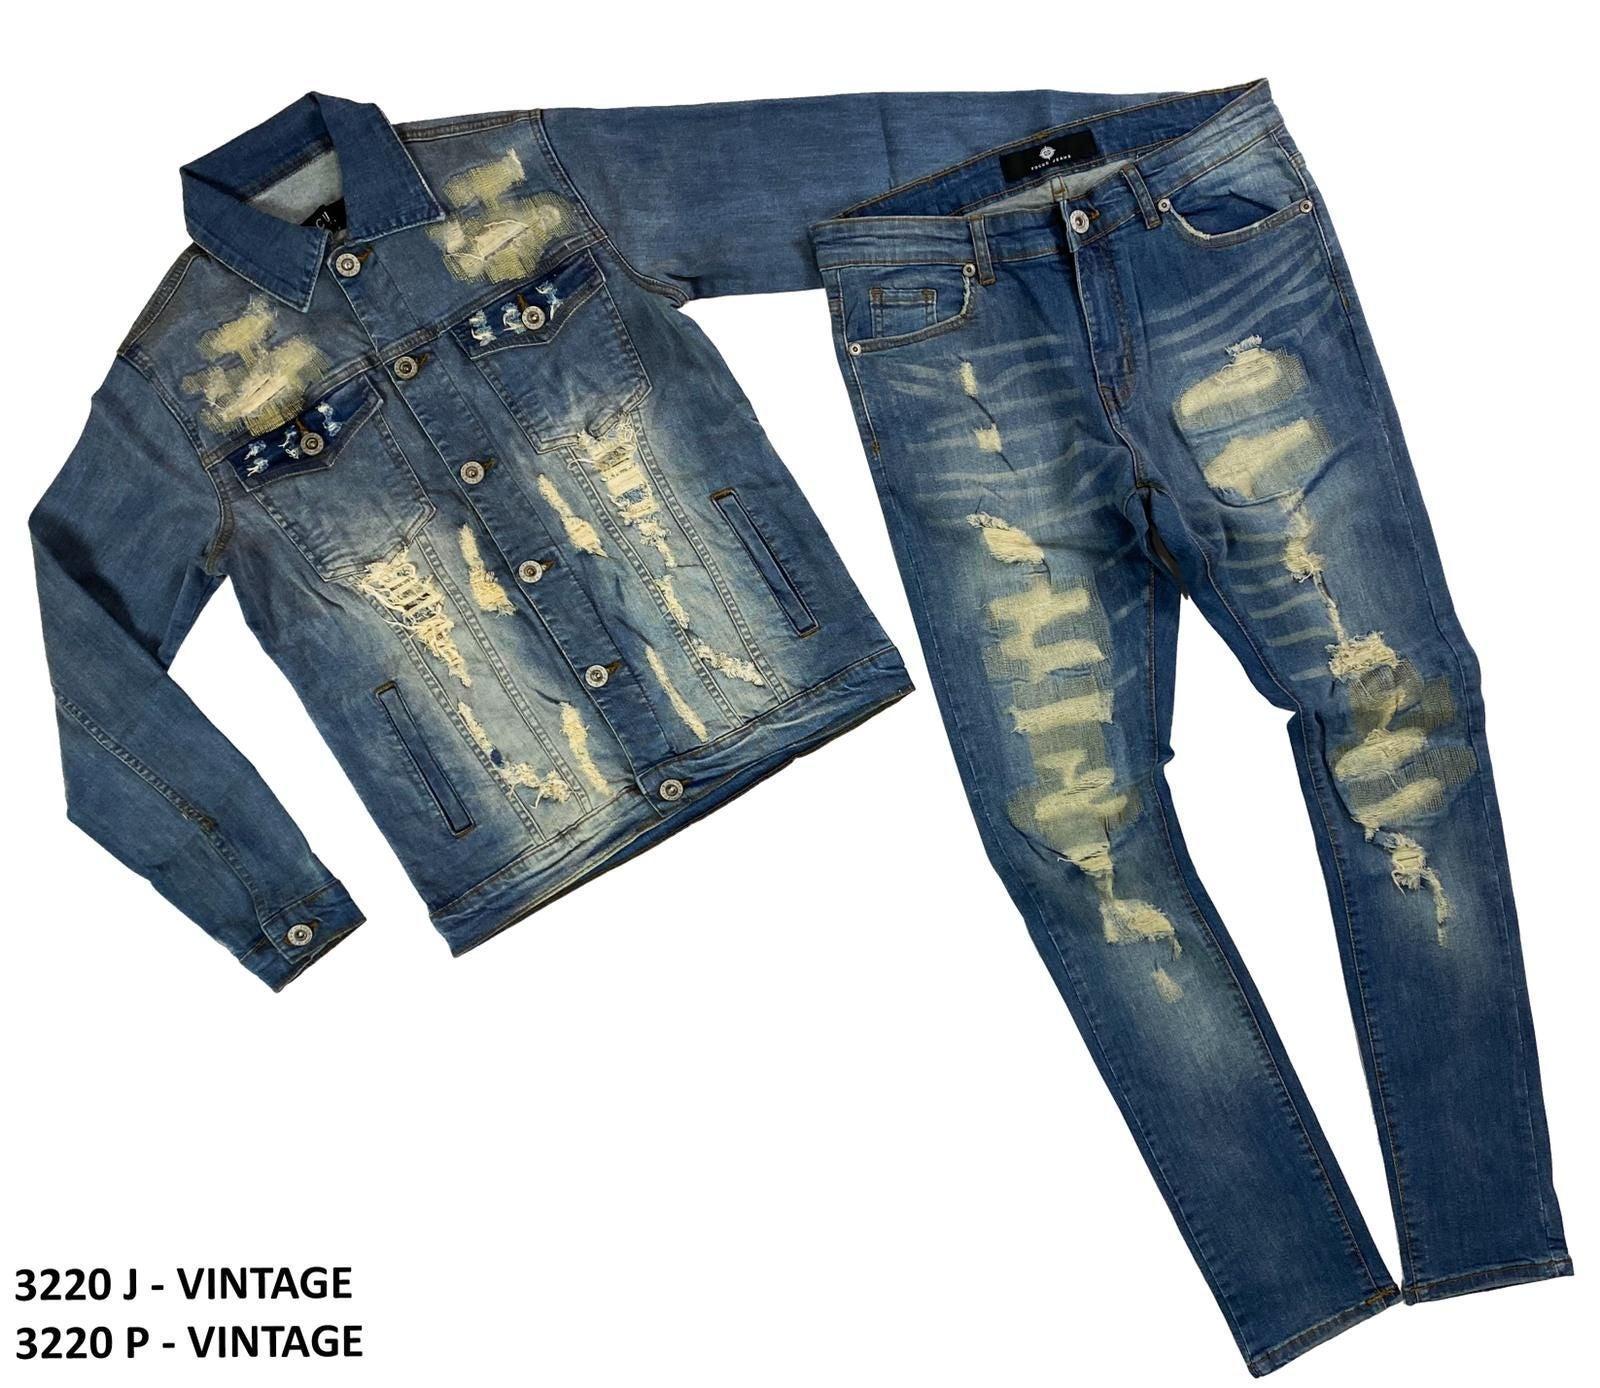 New Men's biker jeans Set